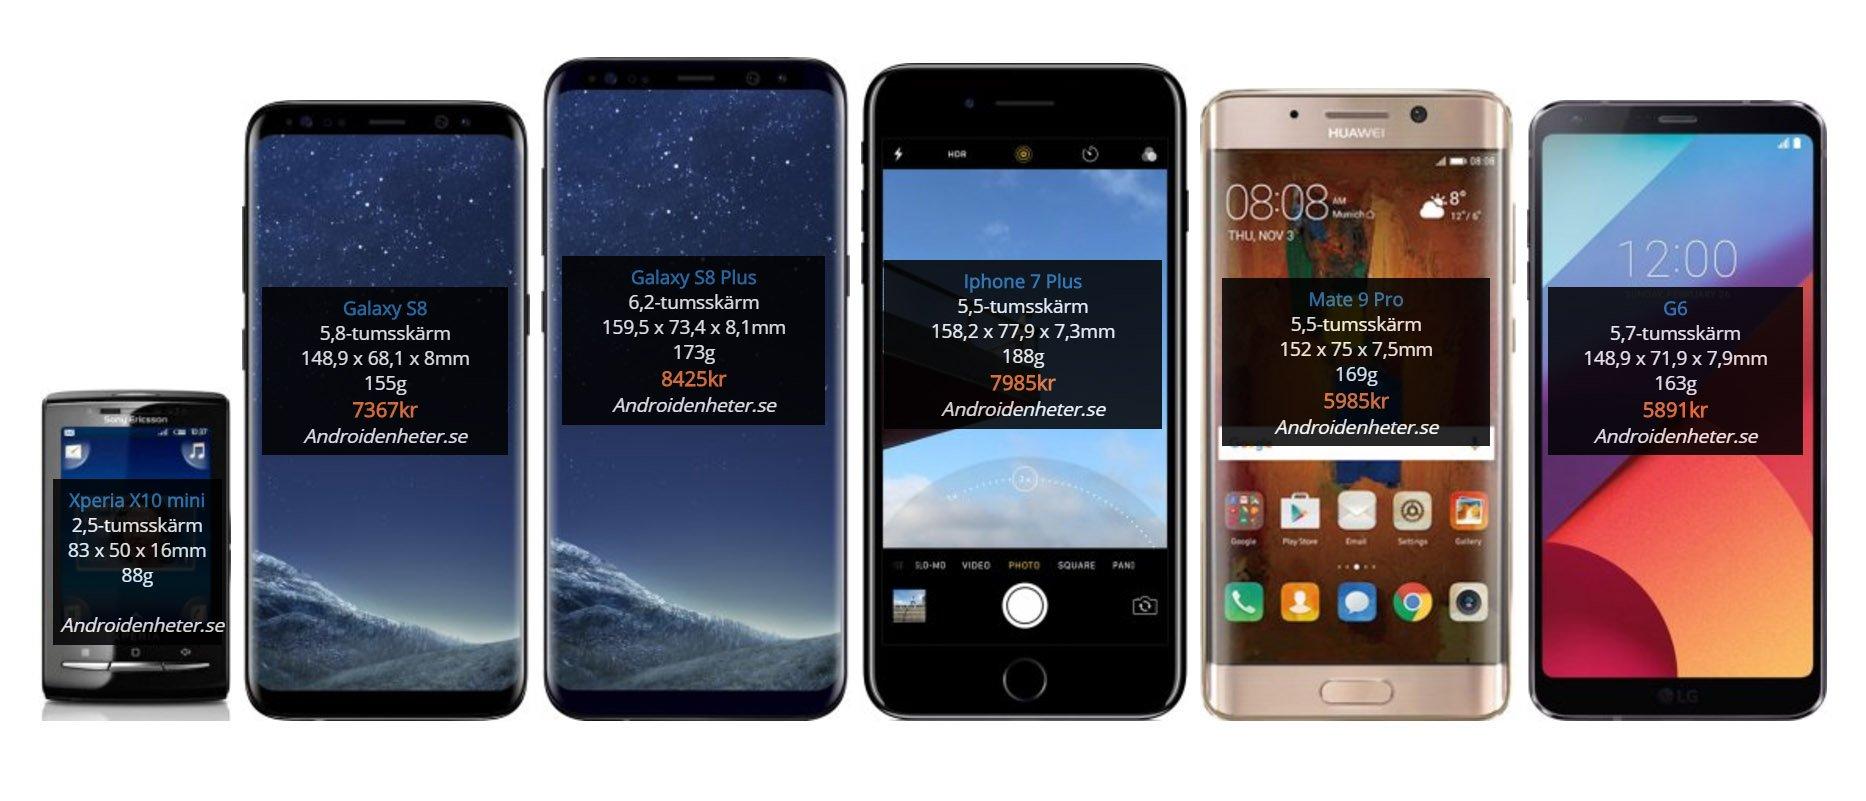 Test av Samsung Galaxy S8 Plus - Swedroid fc52bfbbeed3b